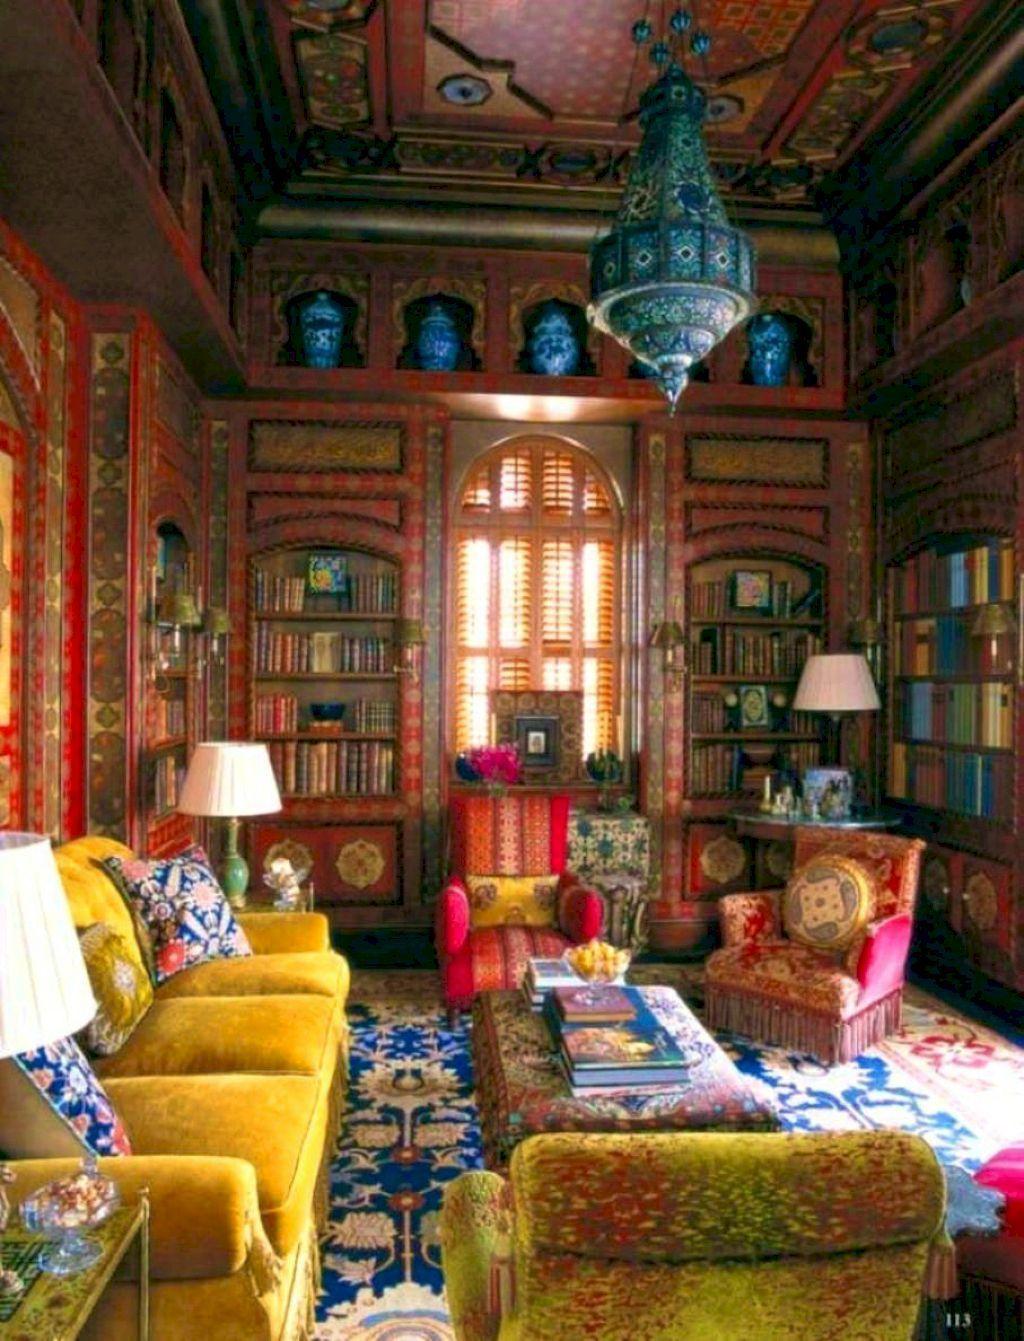 Royal living room wall art.  Source: Pinterest